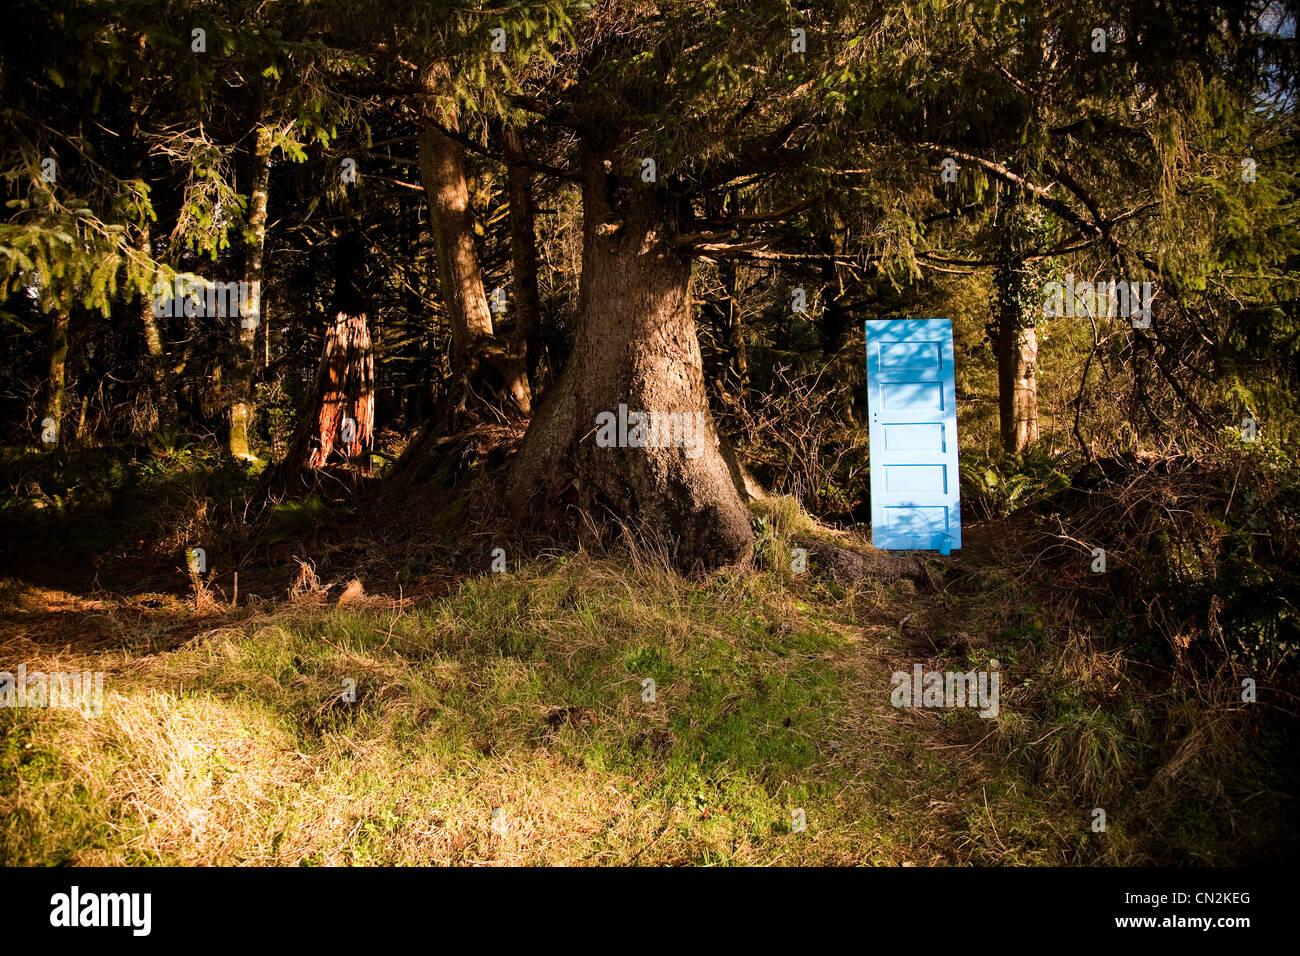 Porte peinte en bleu dans la forêt Photo Stock